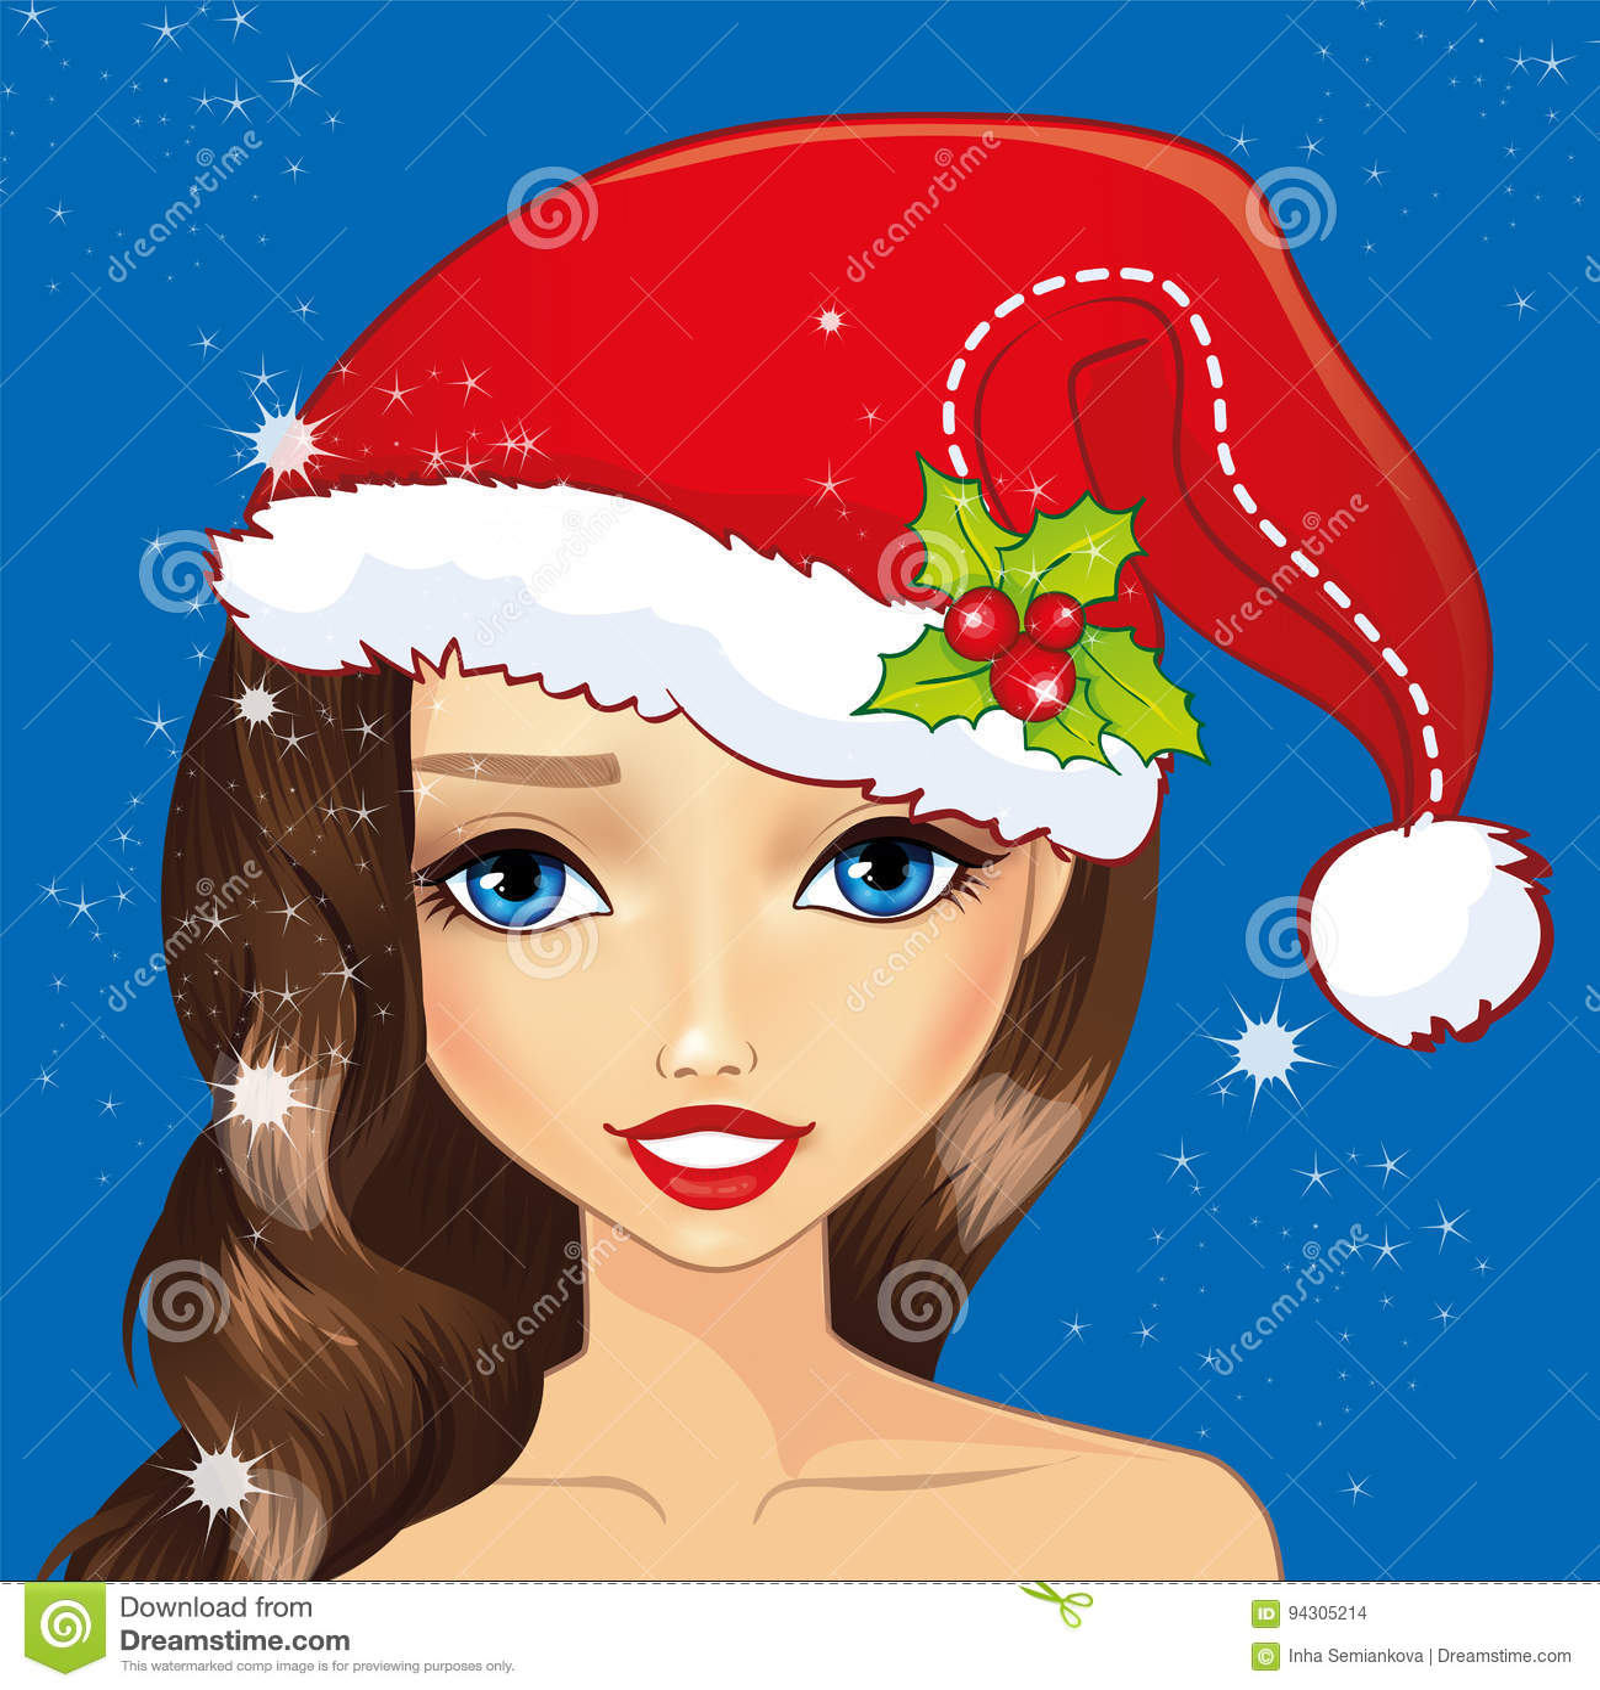 7df2dd40de958 Avatar Girl With Christmas Hat Stock Vector - Illustration of trendy ...